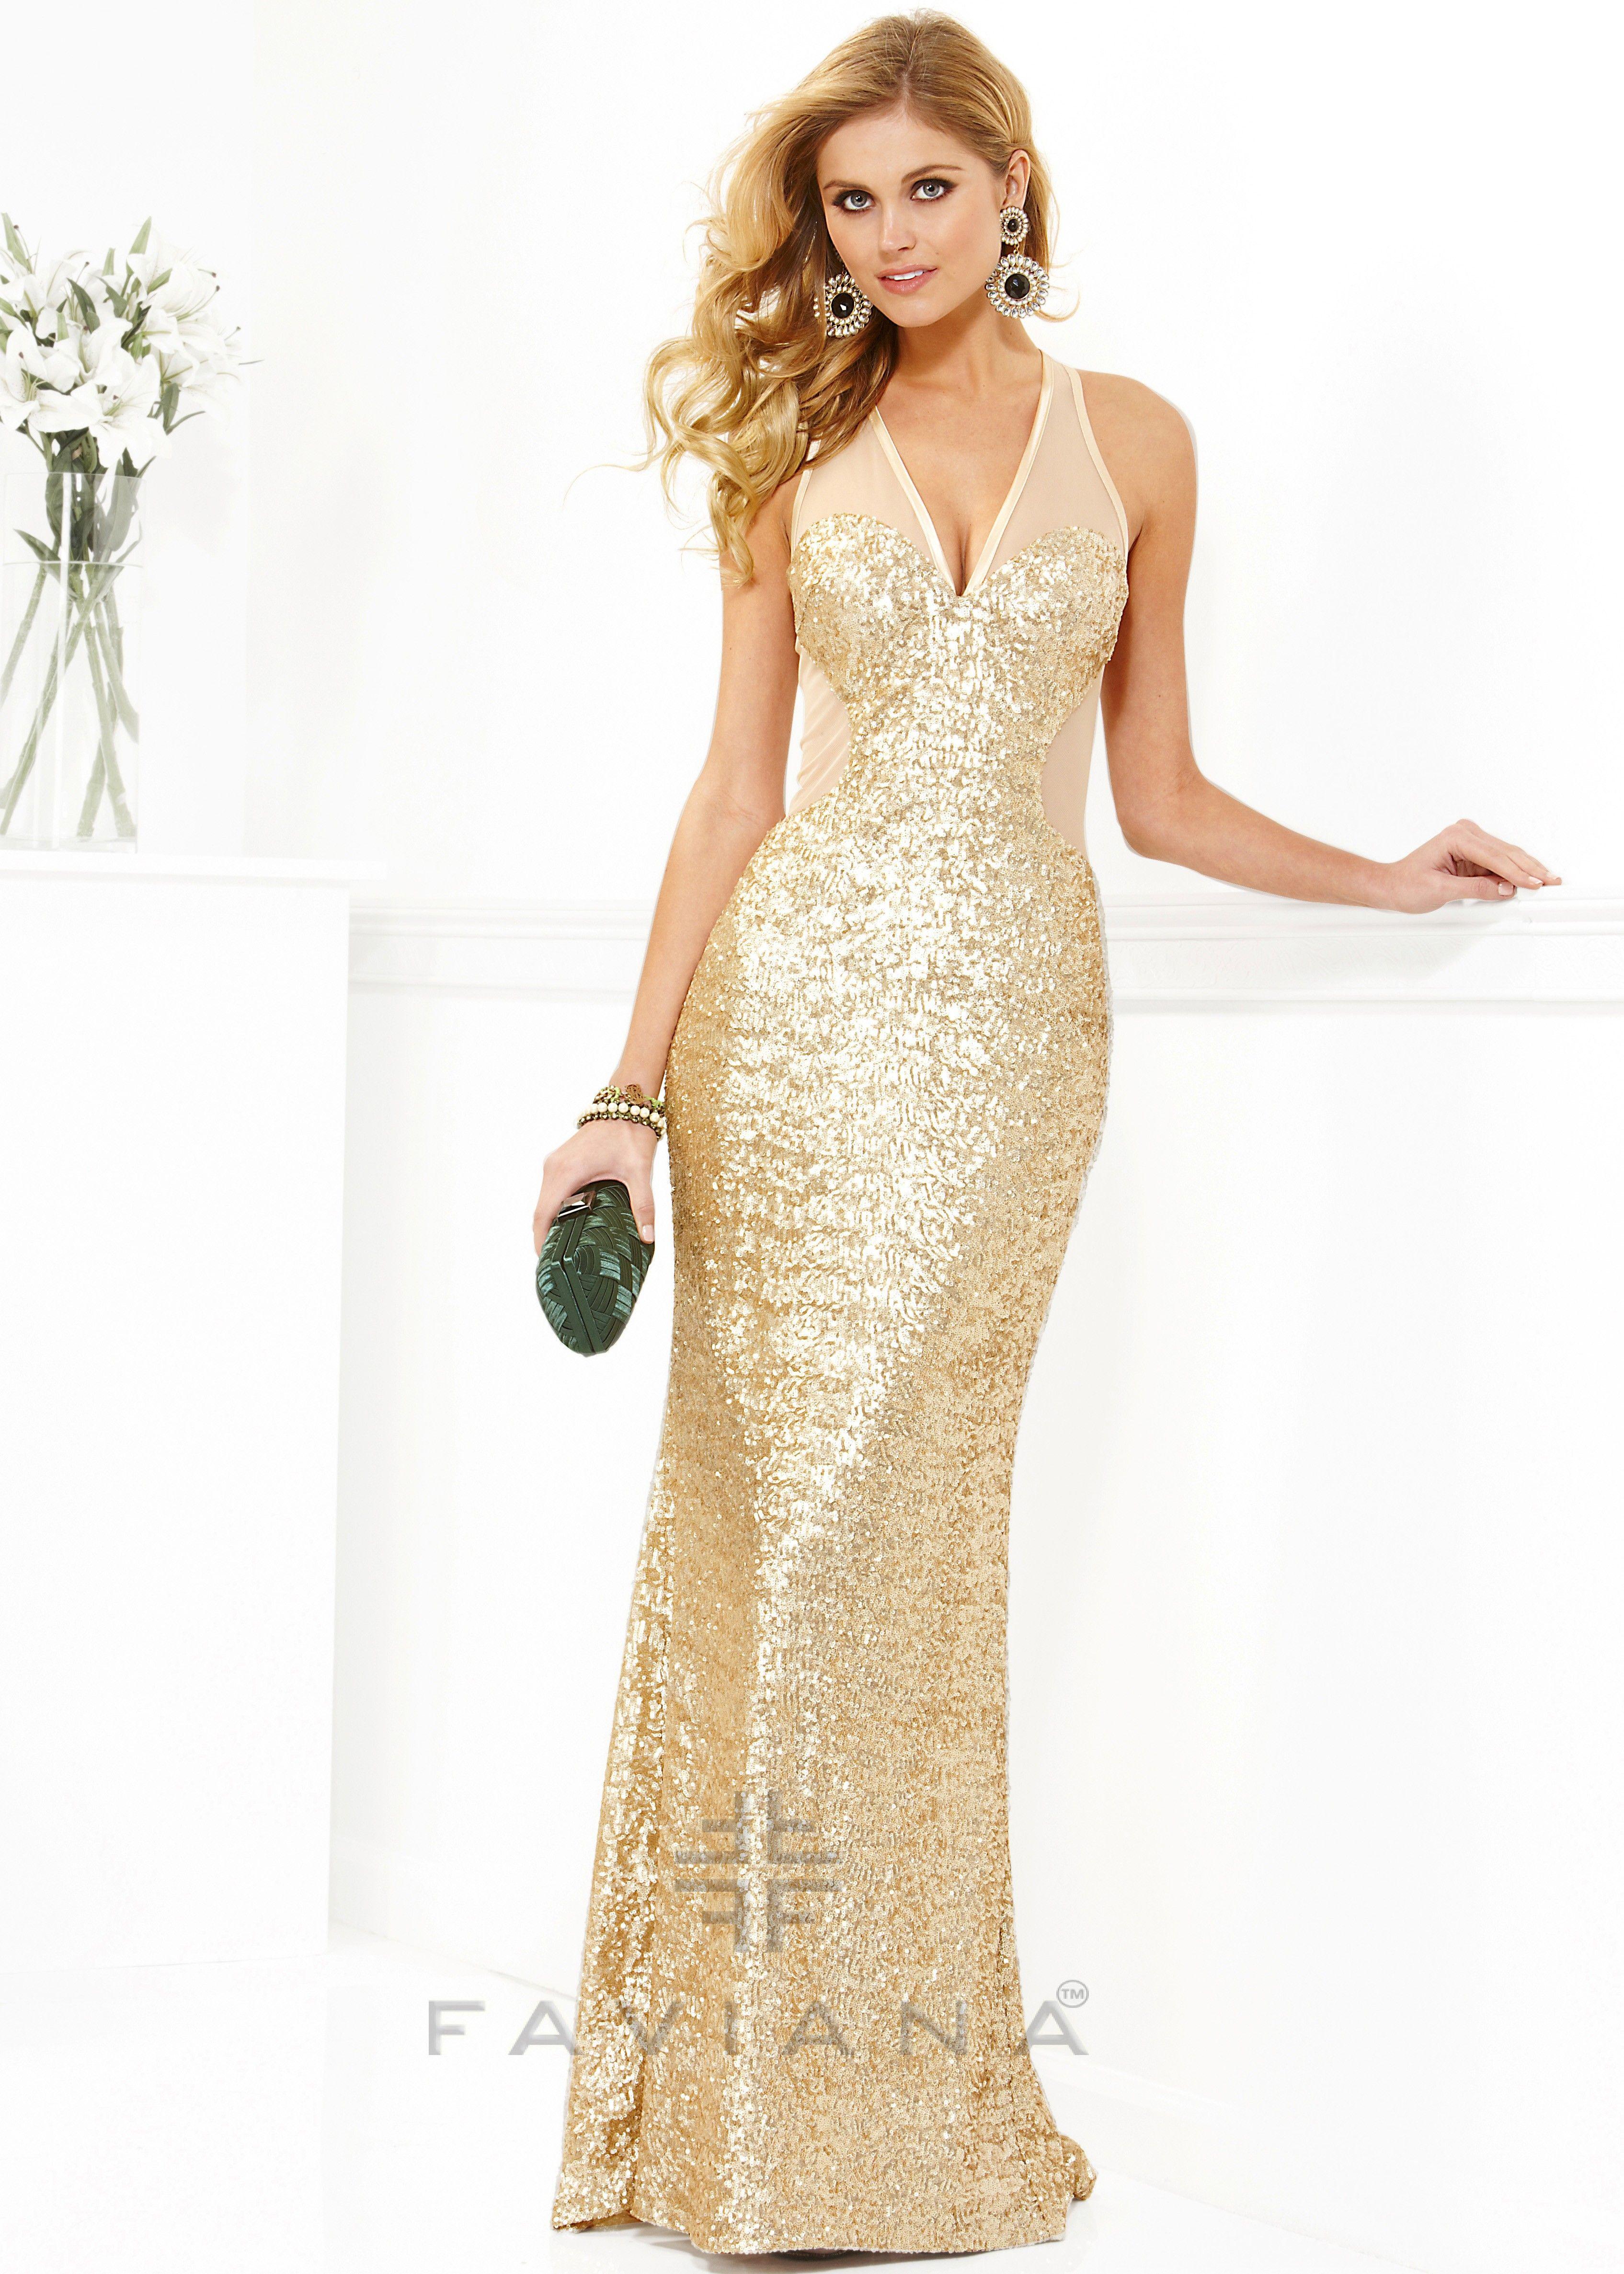 Faviana 7104 - Gold Sequin Dress, 2013 Prom Dresses - RissyRoos.com ...